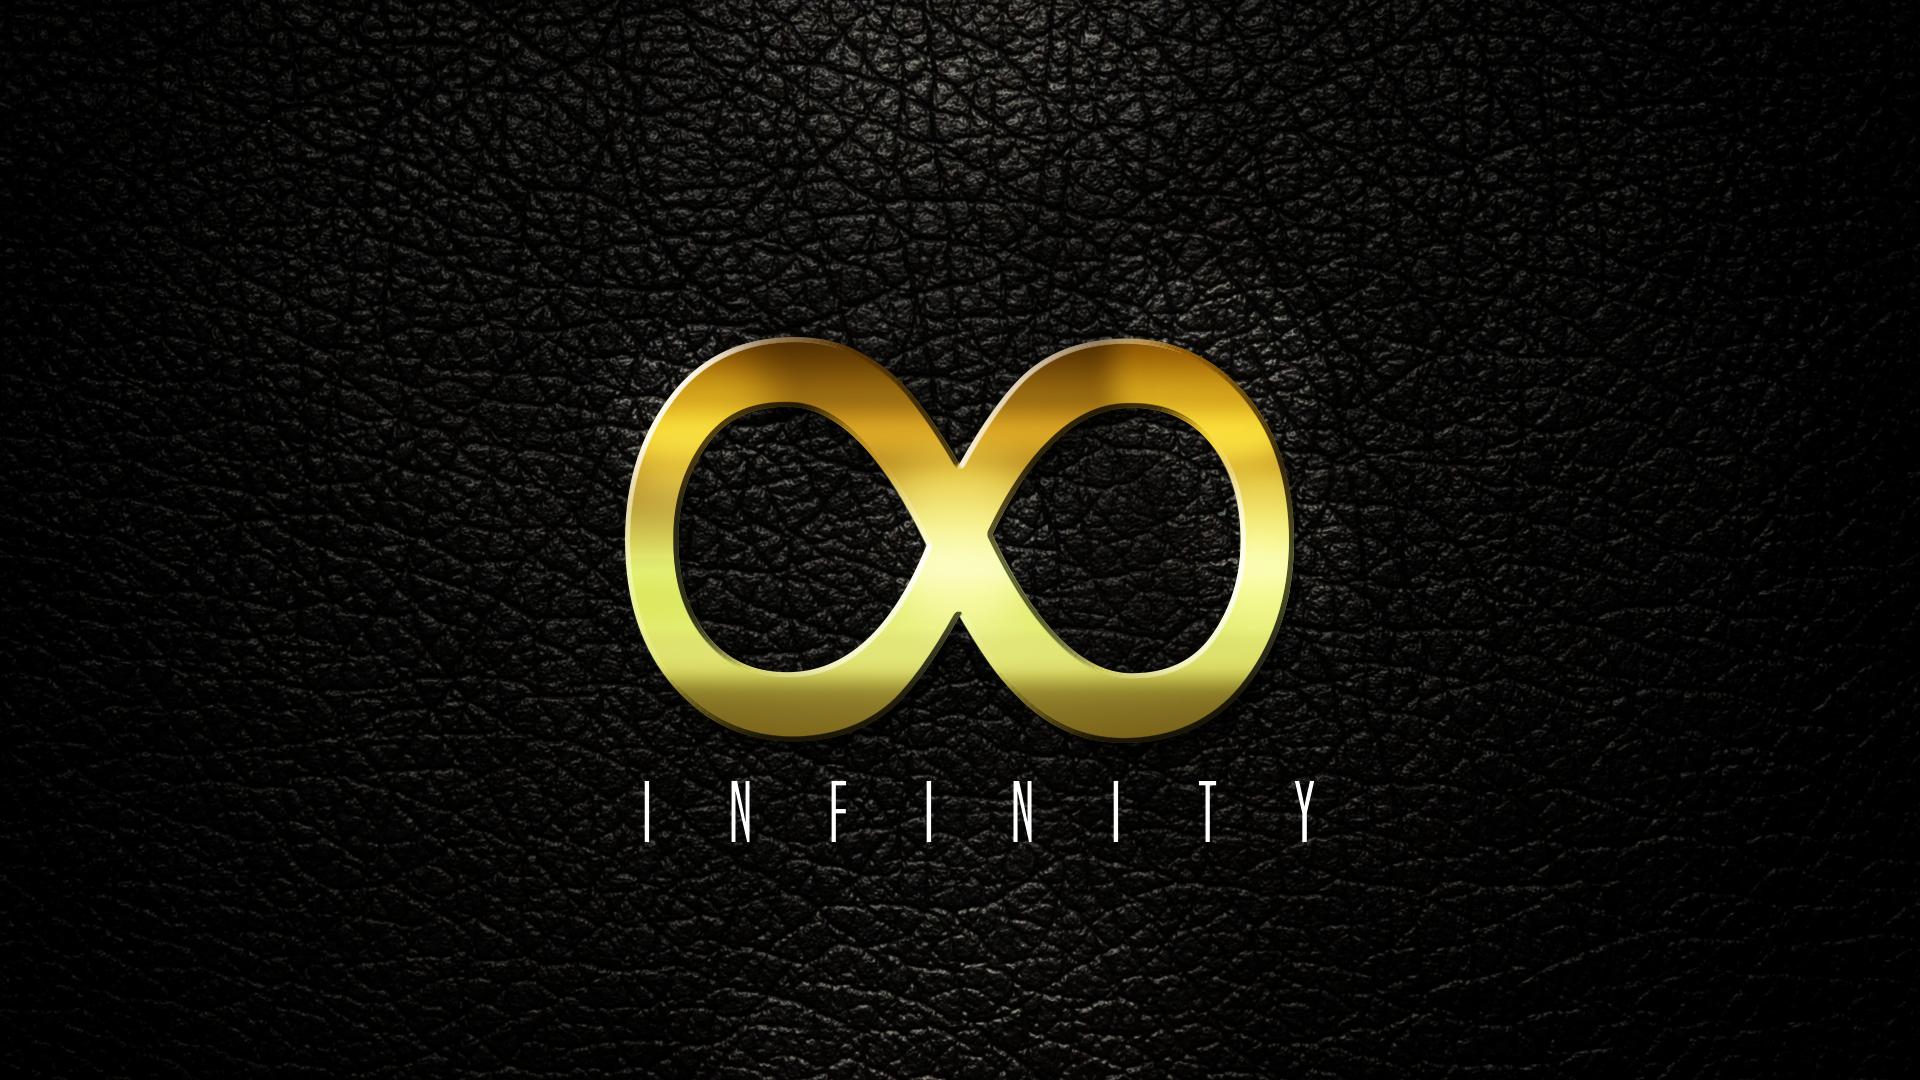 infinity wallpaper 37 wallpapers � hd wallpapers